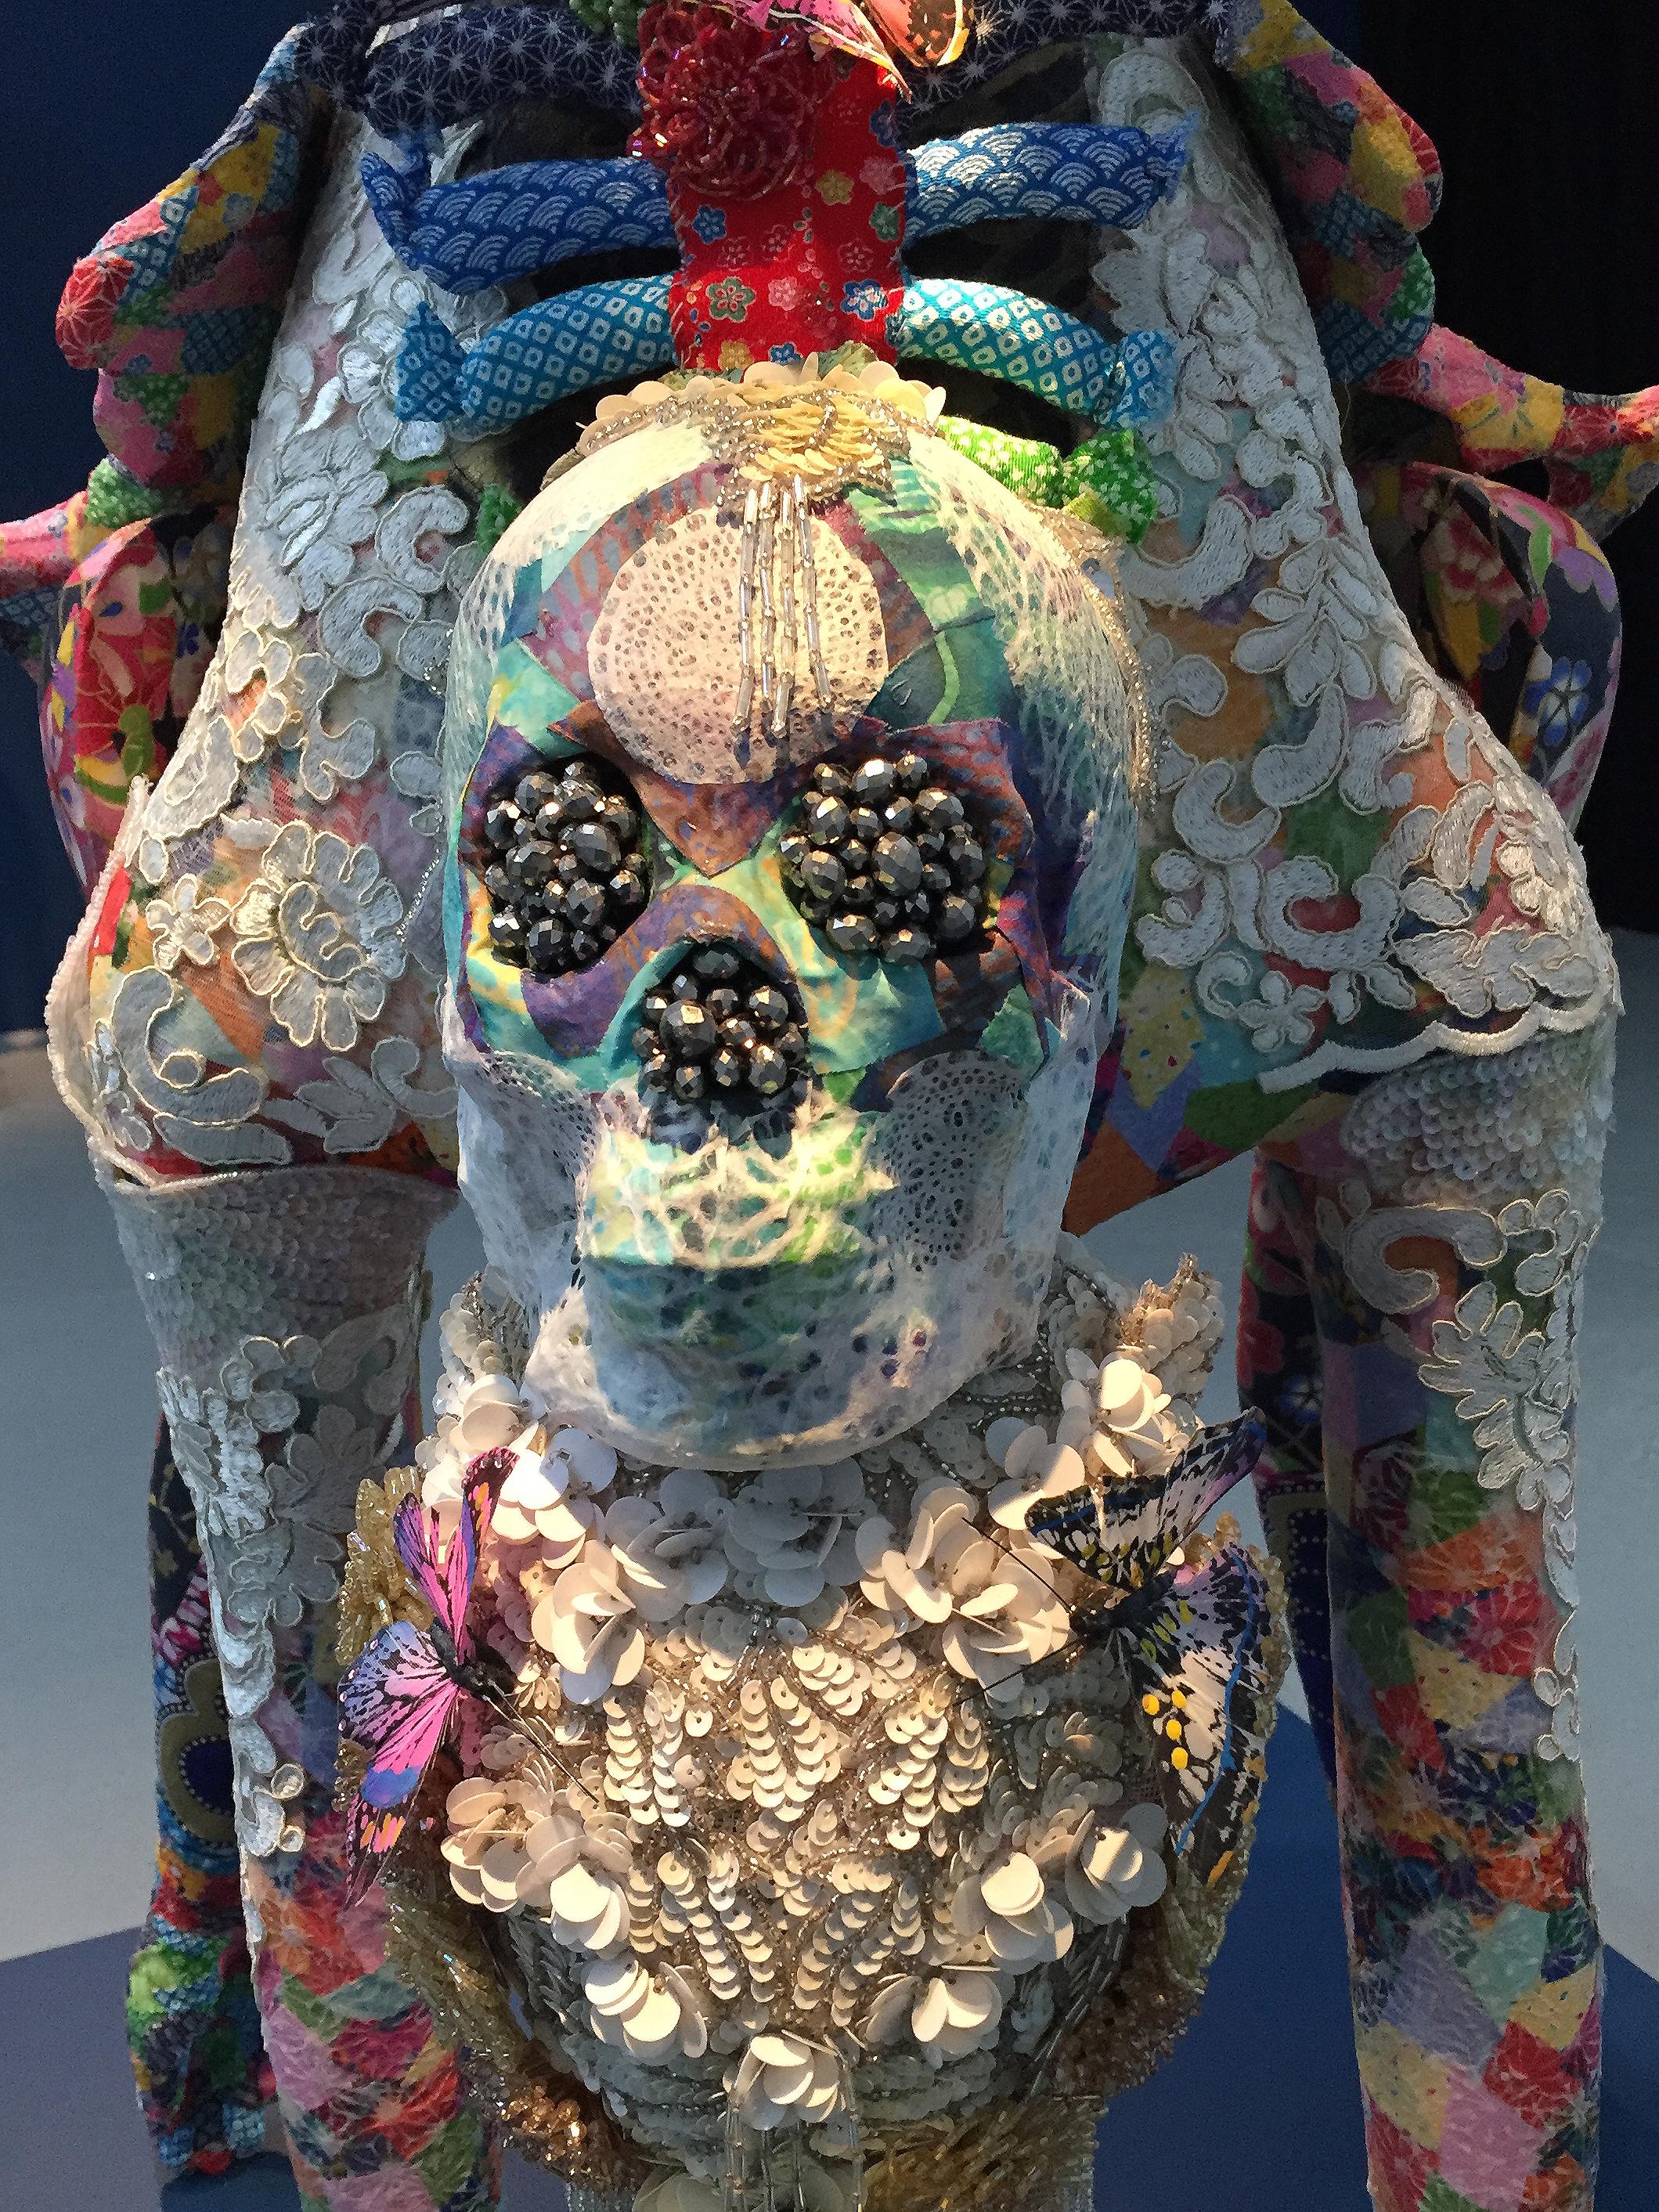 Saya Woolfalk,  ChimaCloud Crystal Body B , 2017 (Detail View), Mixed Media 56 x 18 x 43 inches. Copyright Saya Woolfalk, courtesy Leslie Tonkonow Artworks + Projects, New York